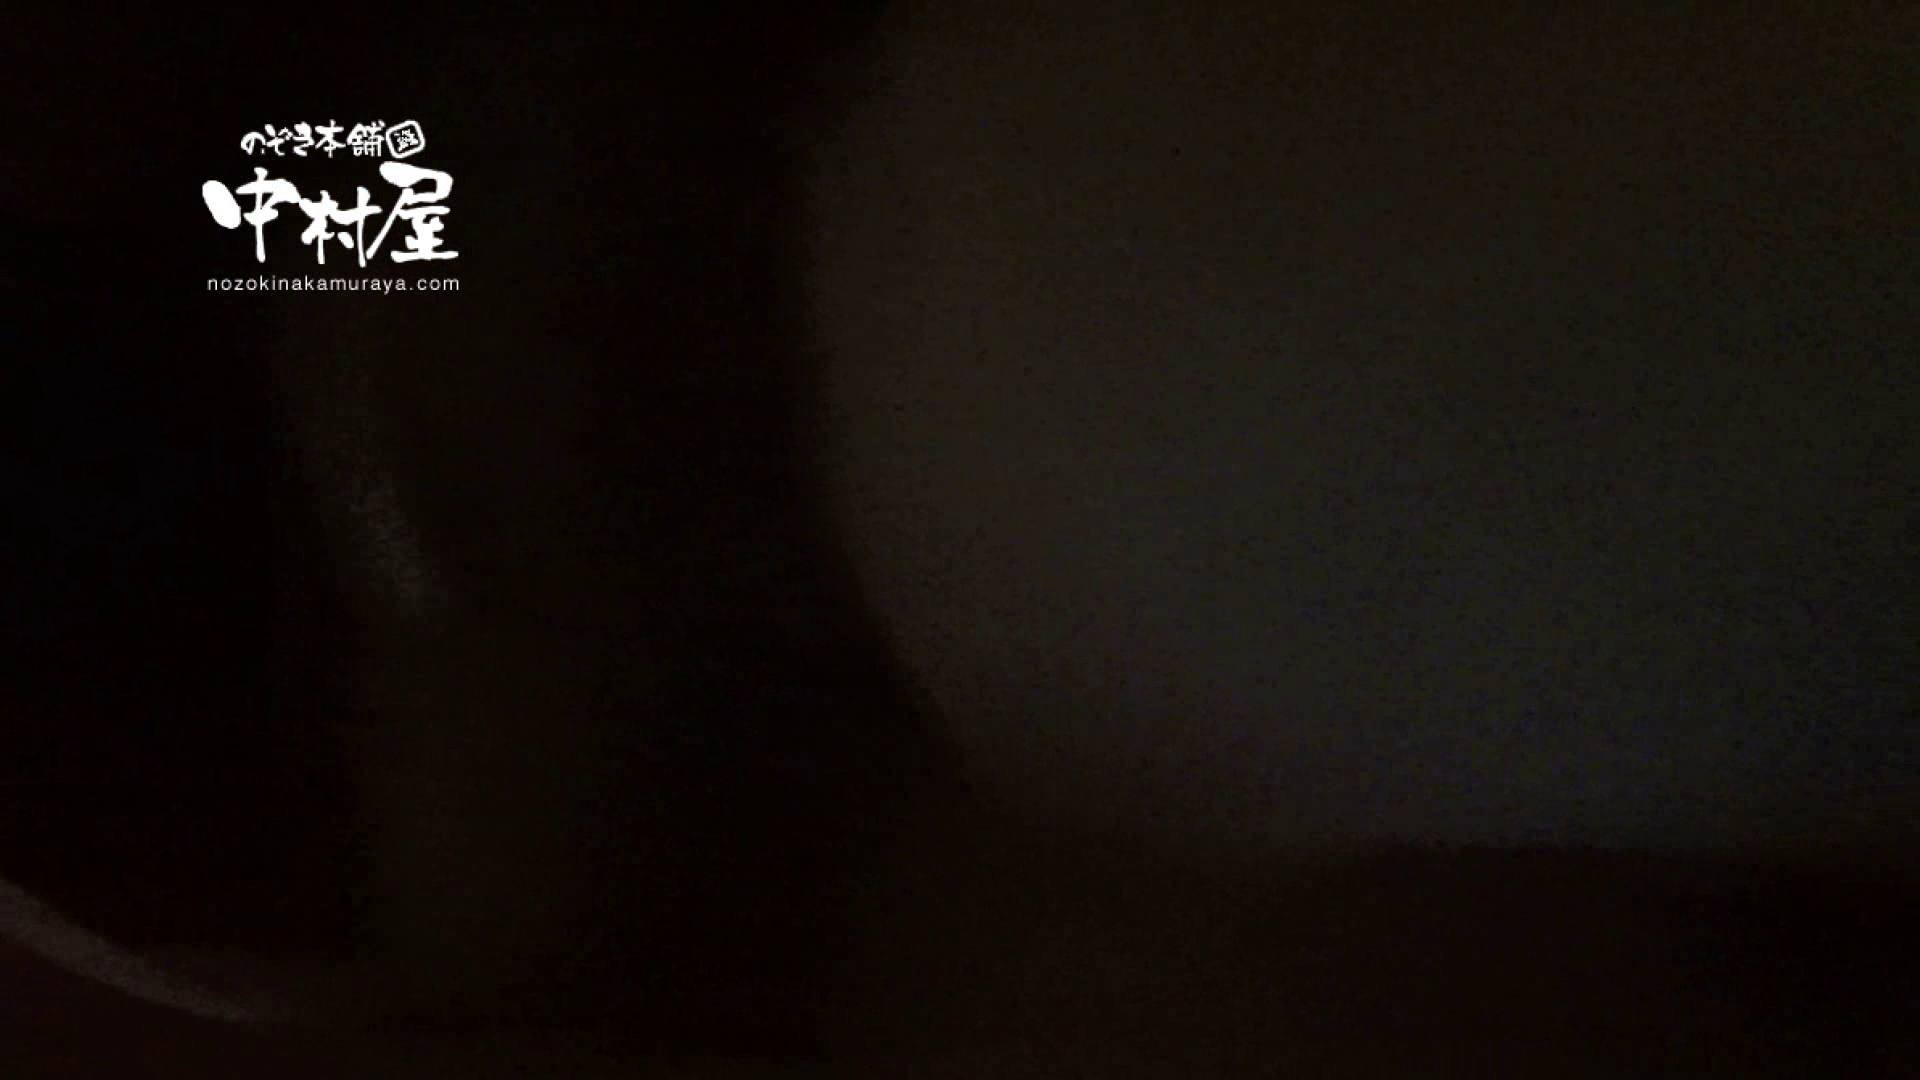 鬼畜 vol.08 極悪!妊娠覚悟の中出し! 後編 鬼畜  47Pix 2